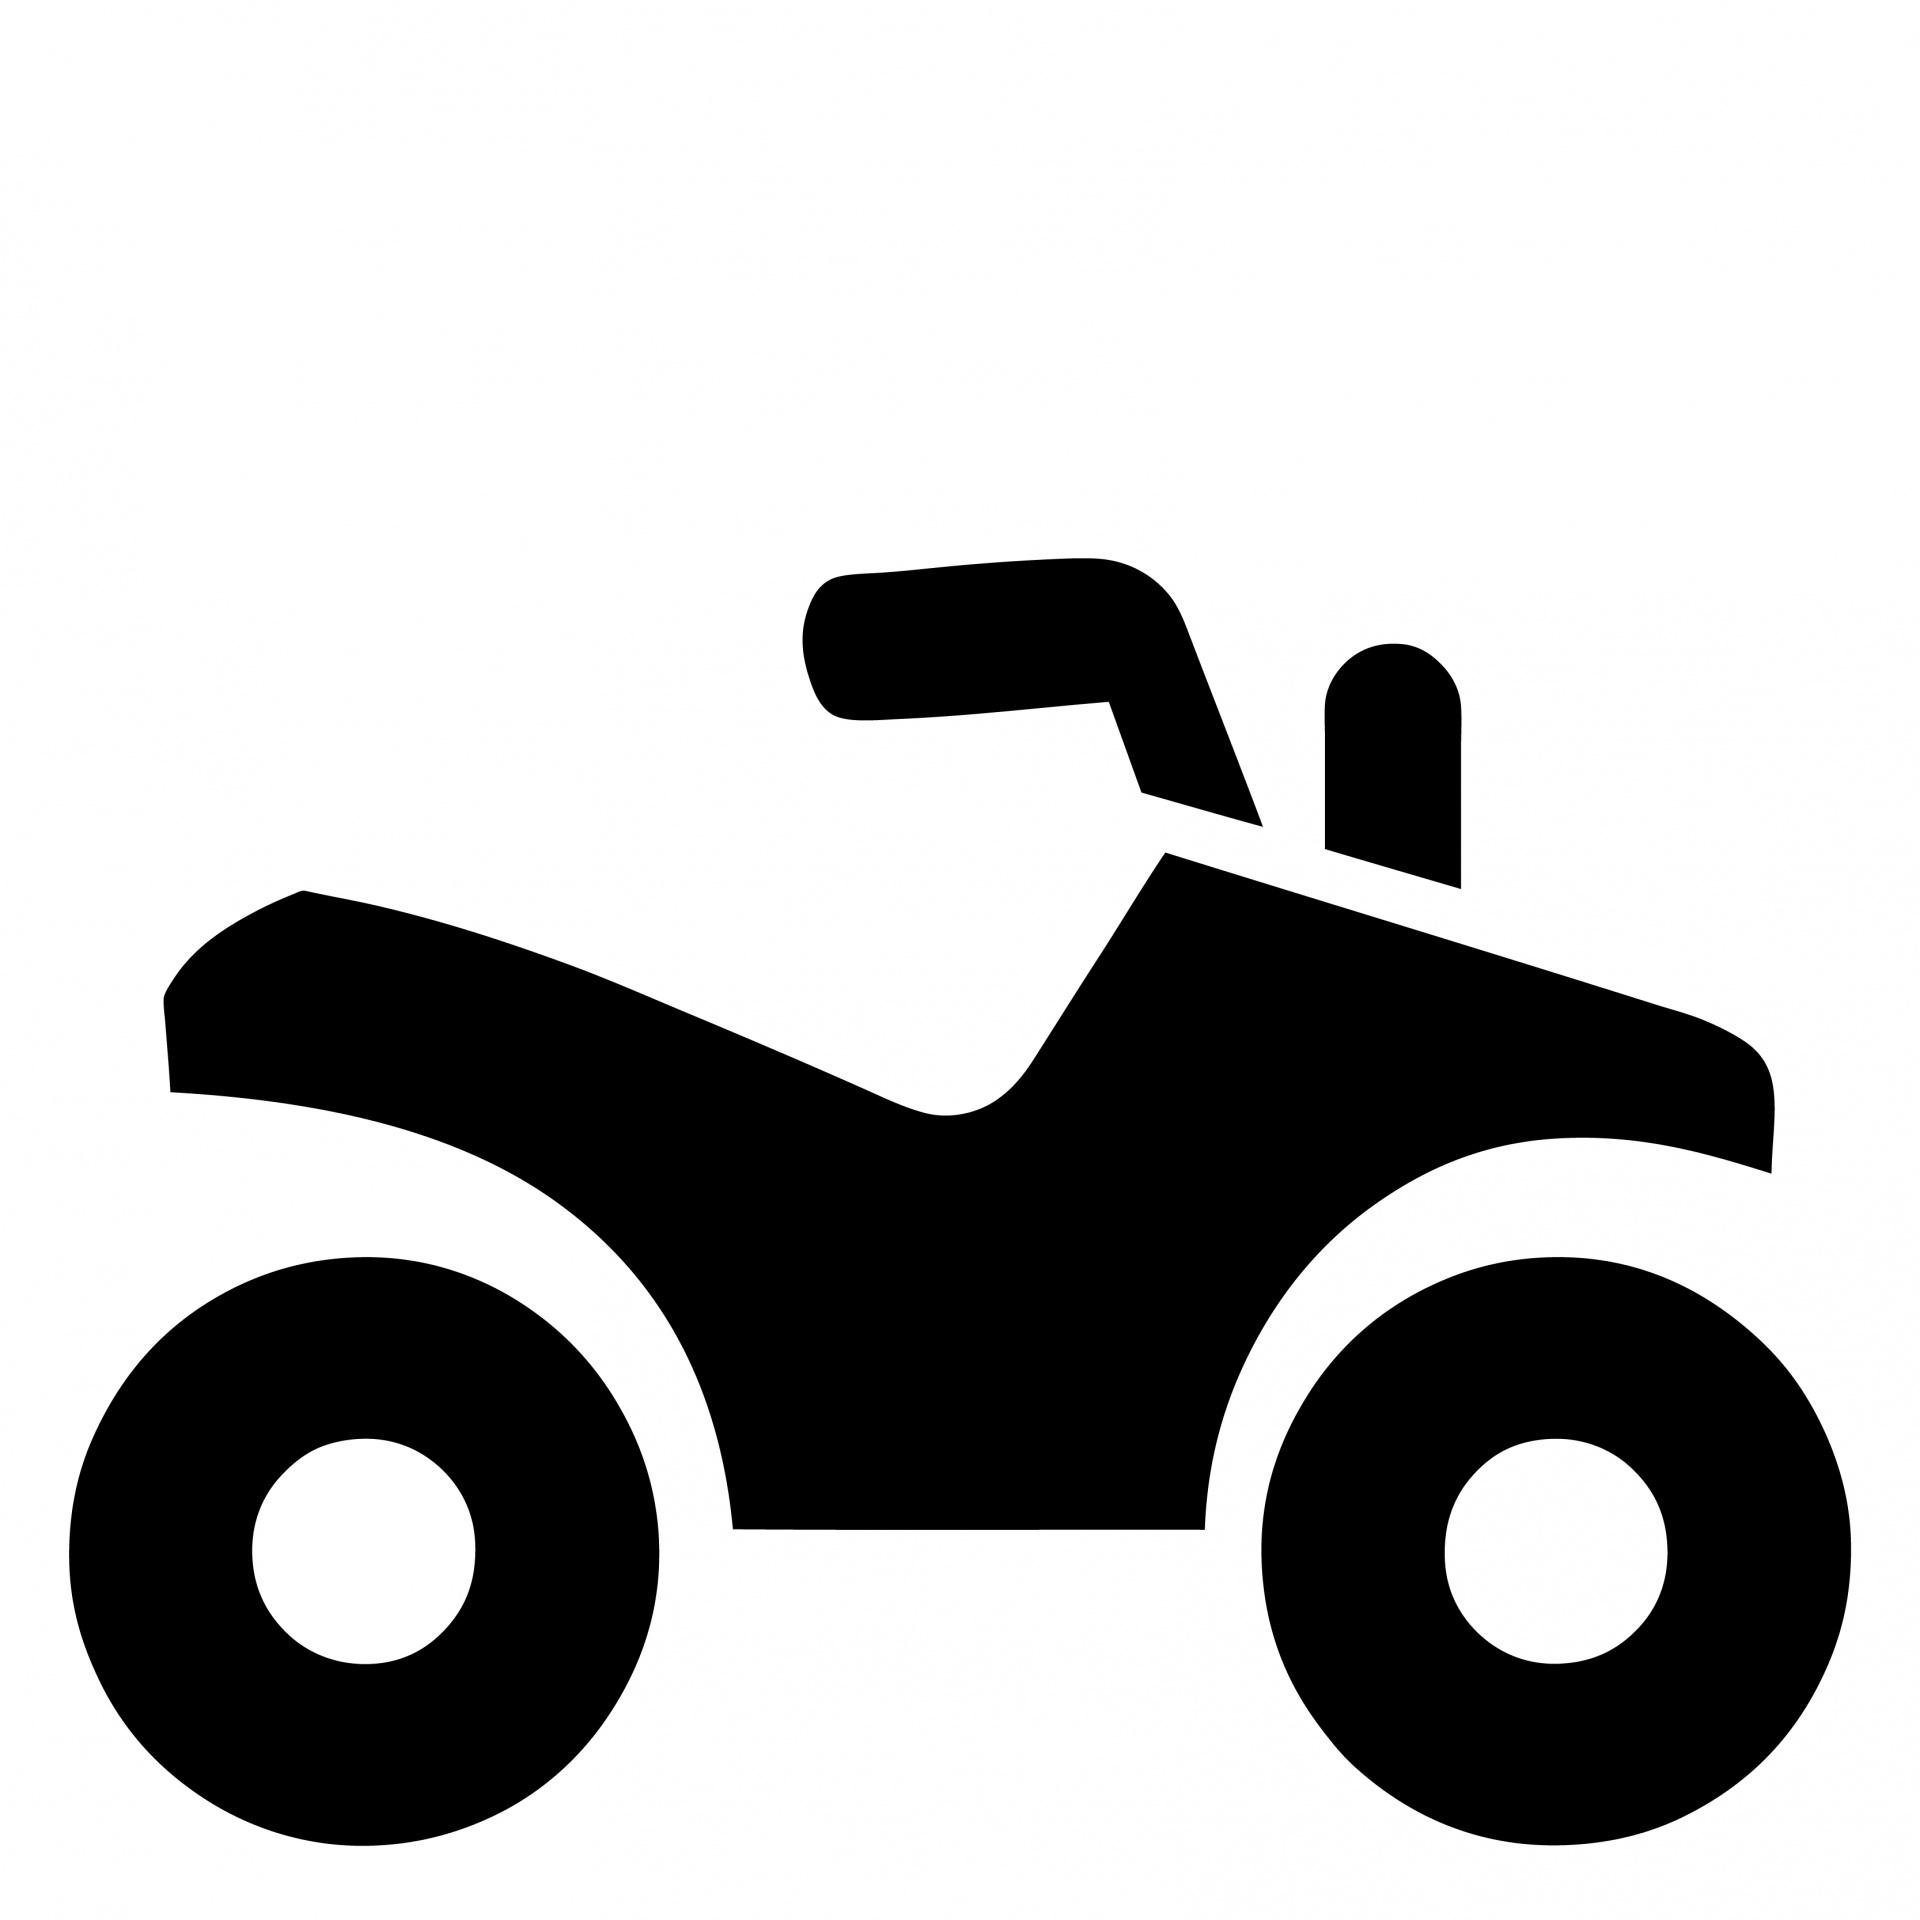 1920x1920 Car Silhouette Logo Symbol Free Stock Photo